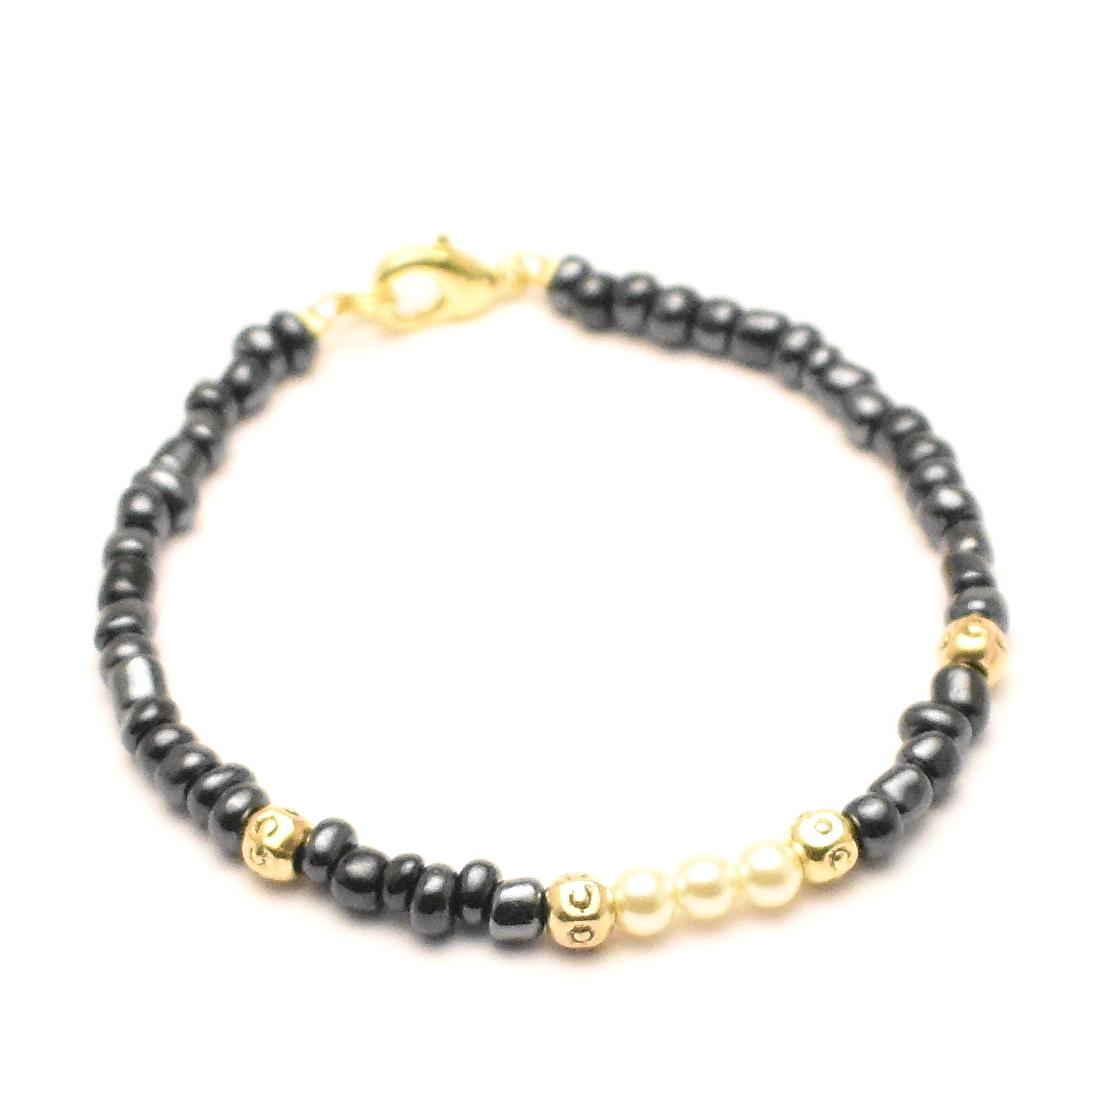 Zwarte kralen armband dames goudkleurige details